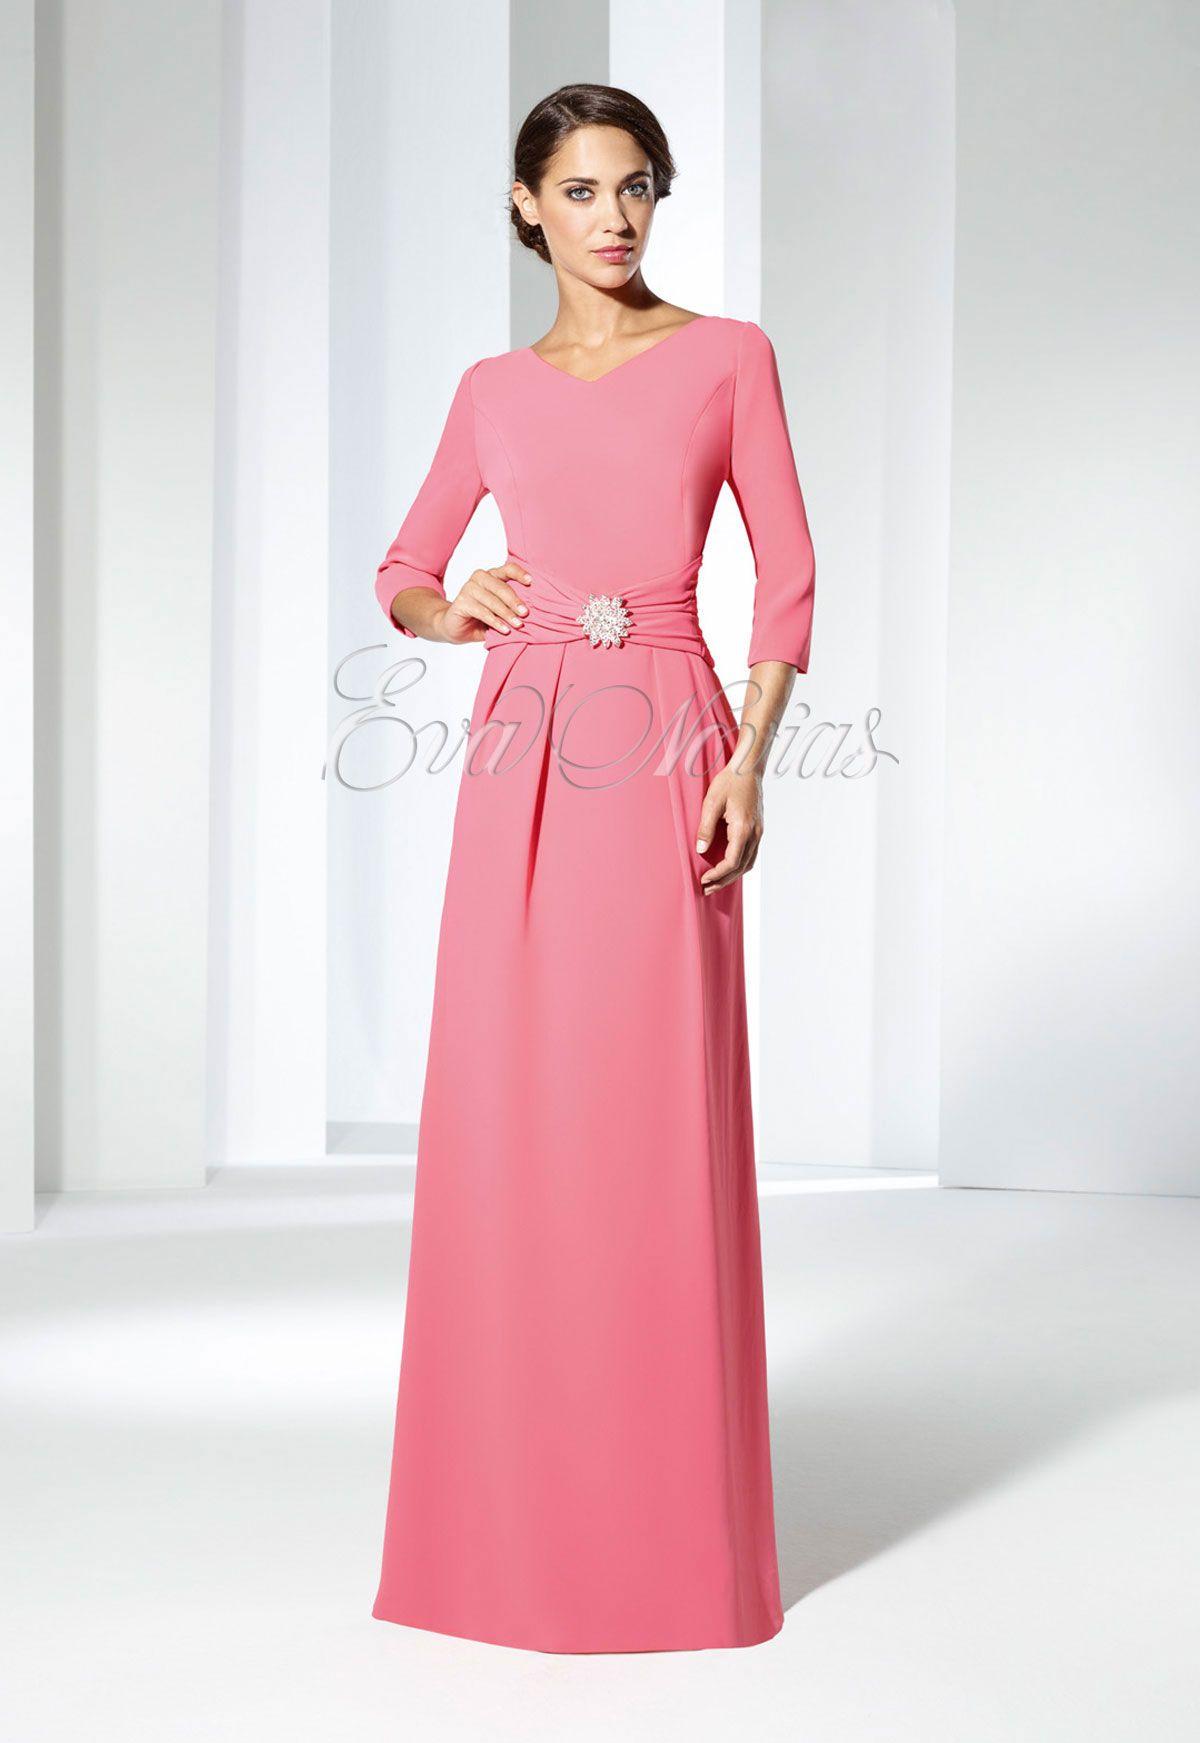 Vestido de fiesta Paloma Camacho 2016 Modelo 2718 en Eva Novias ...